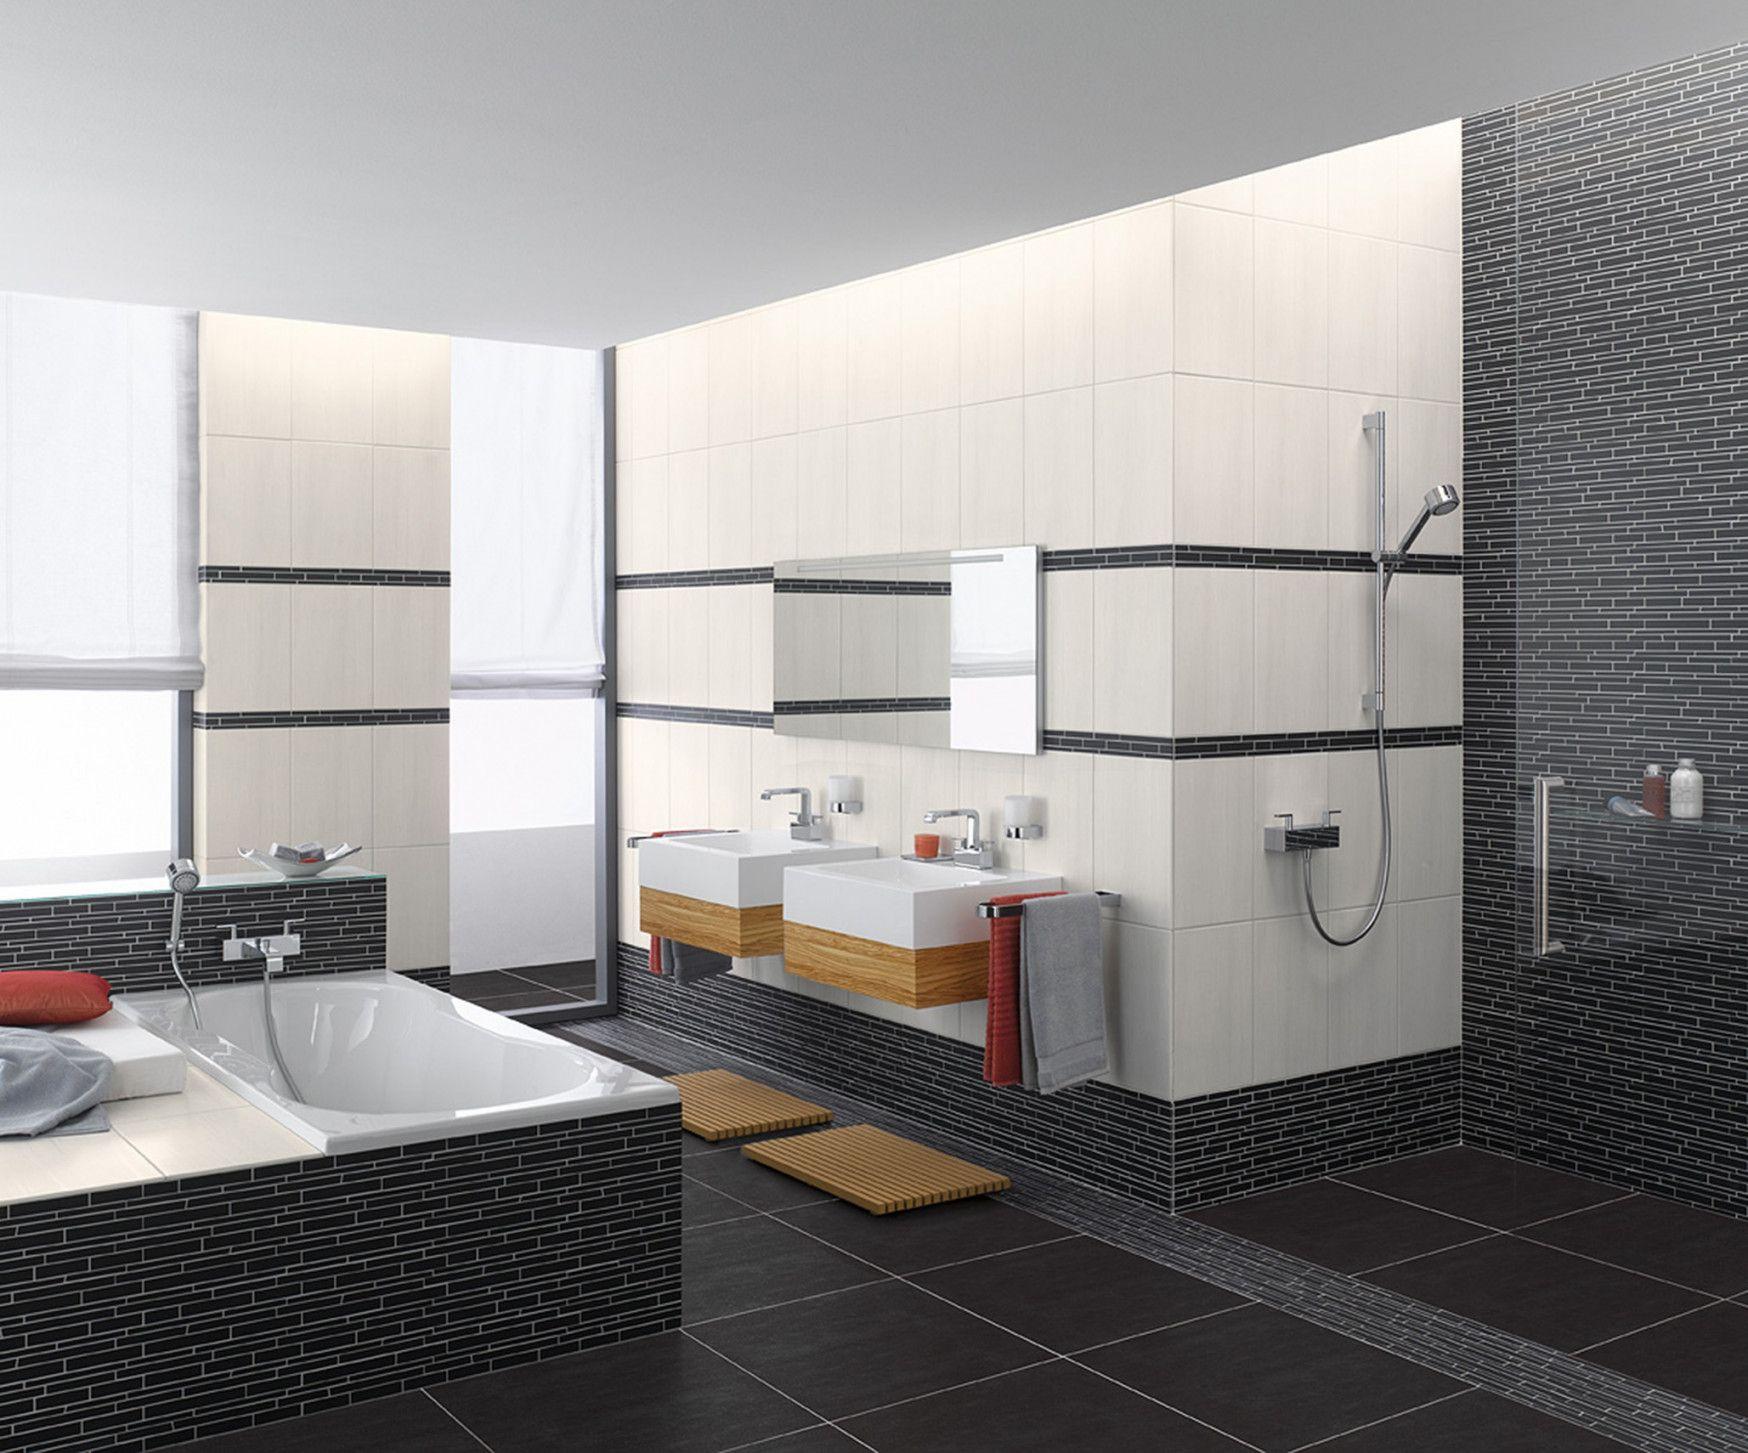 Badezimmer Fliesen Ausstellung Badezimmer Fliesen Badezimmer